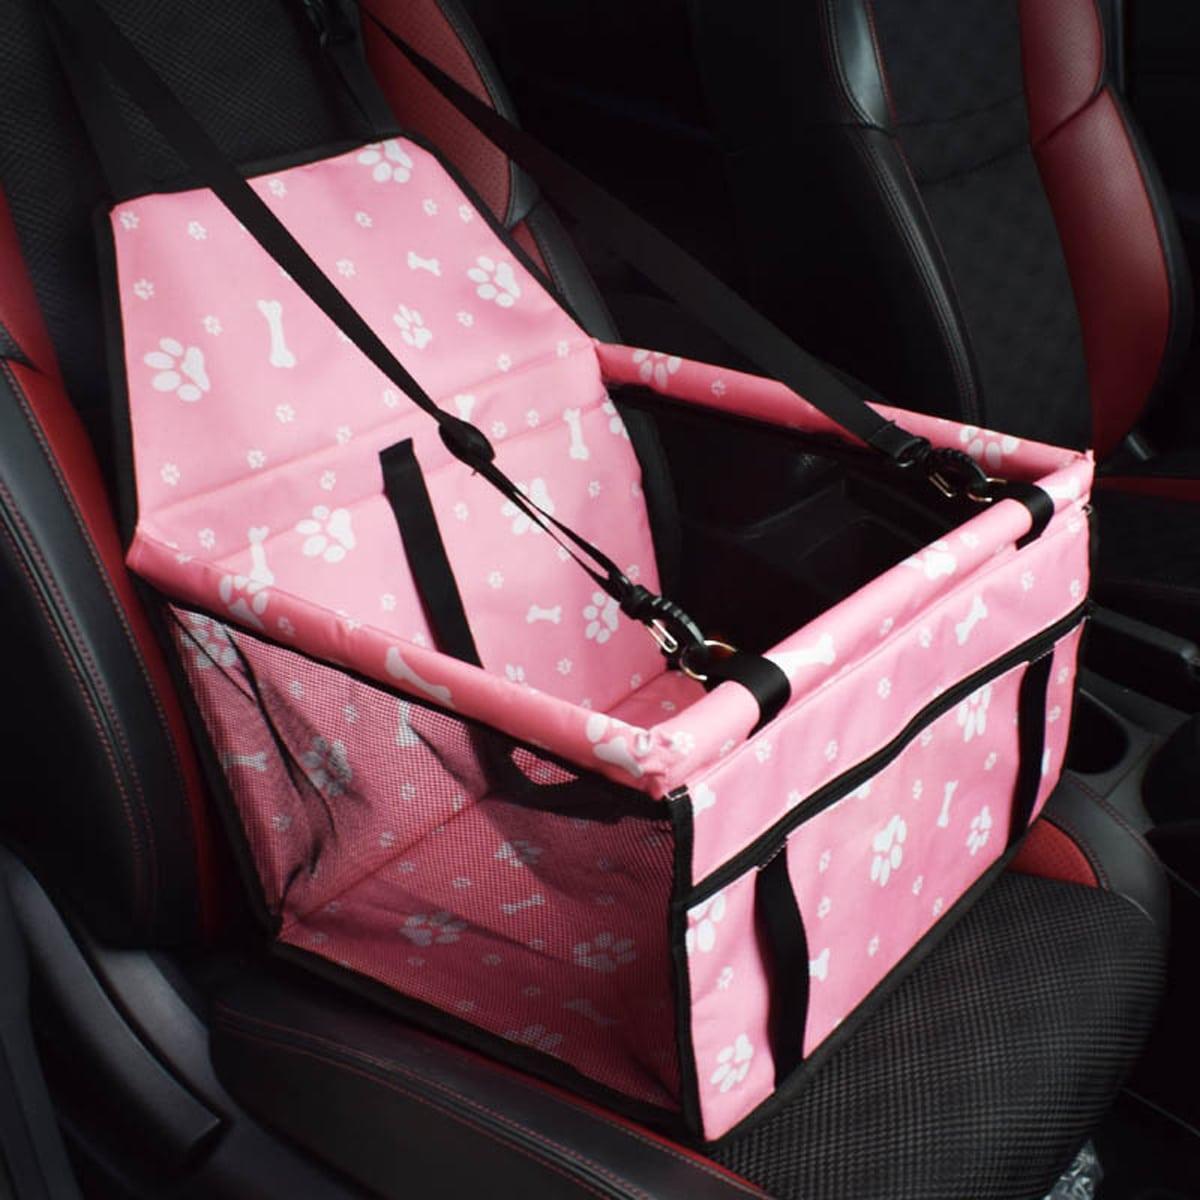 1 Stück Autositz Hundeträgerkorb mit Kontrast Netzstoff